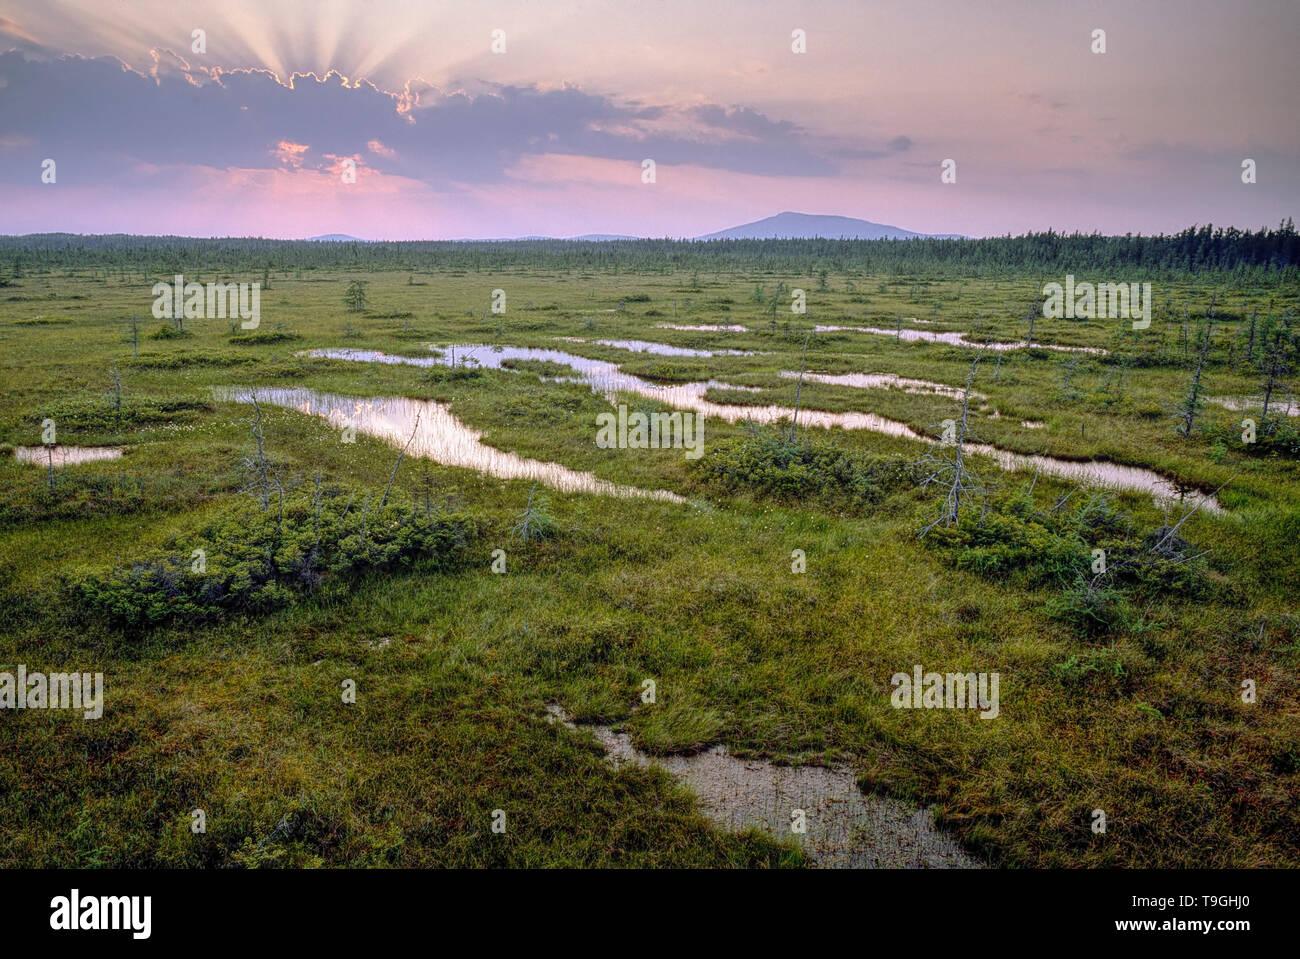 Structured torbiera, Frontenac National Park, Quebec, Canada Immagini Stock